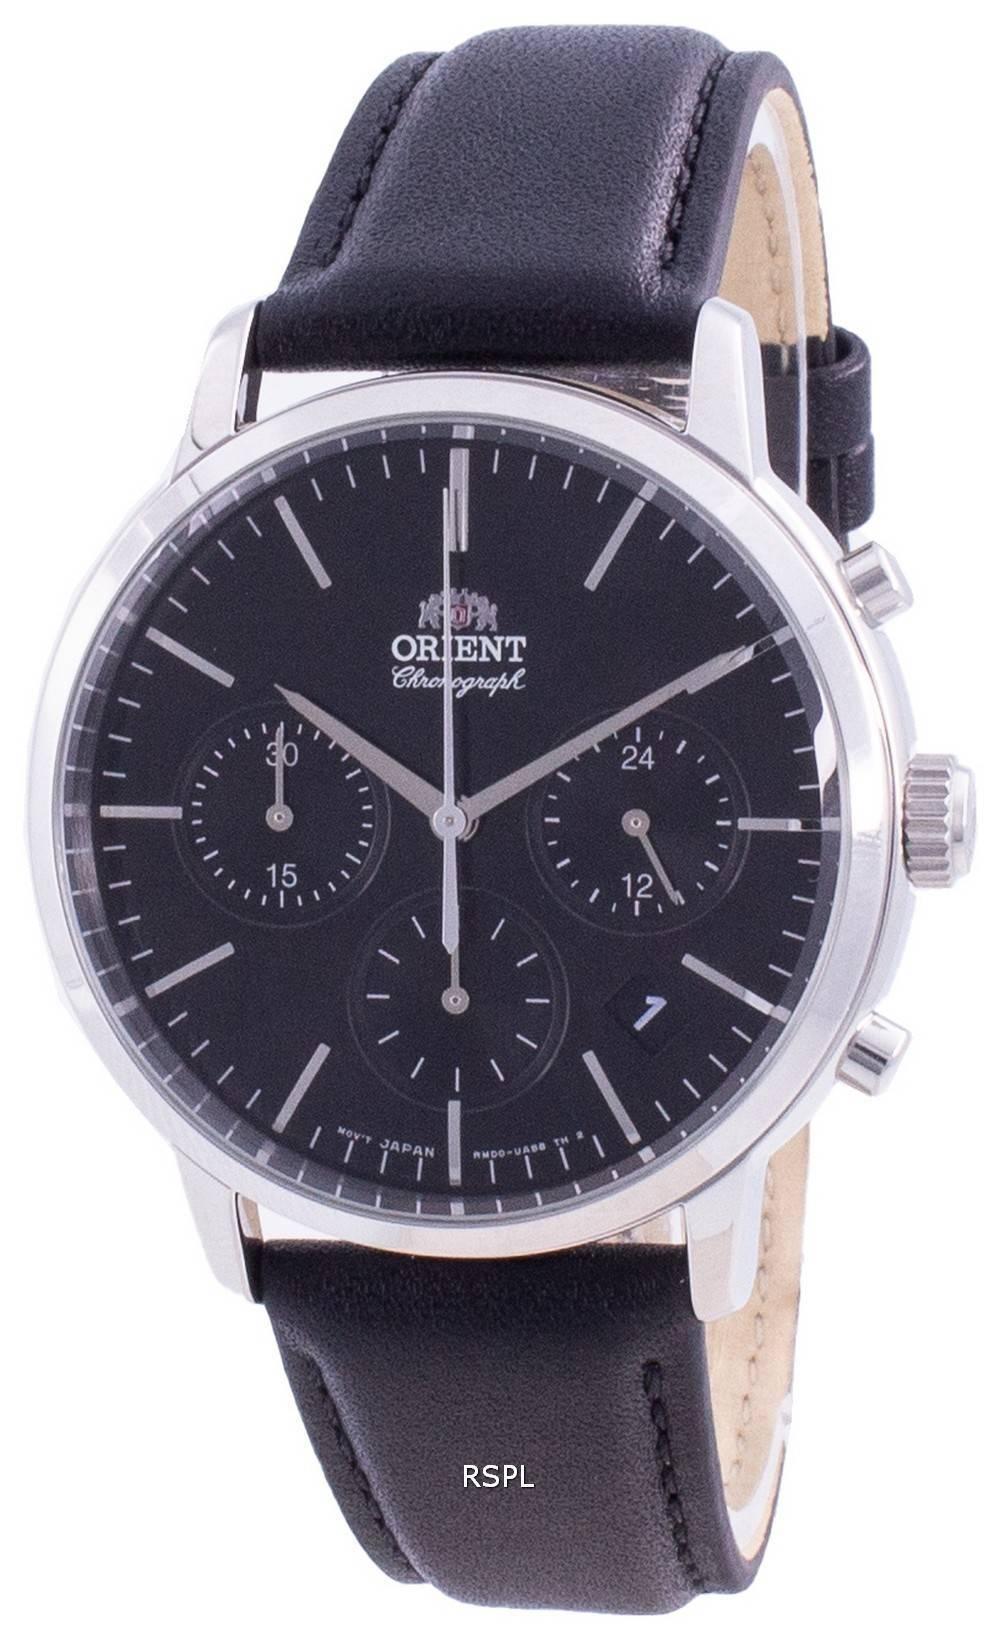 Orient Contemporary Chronograph Black Dial Quartz RA-KV0303B10B Men's Watch